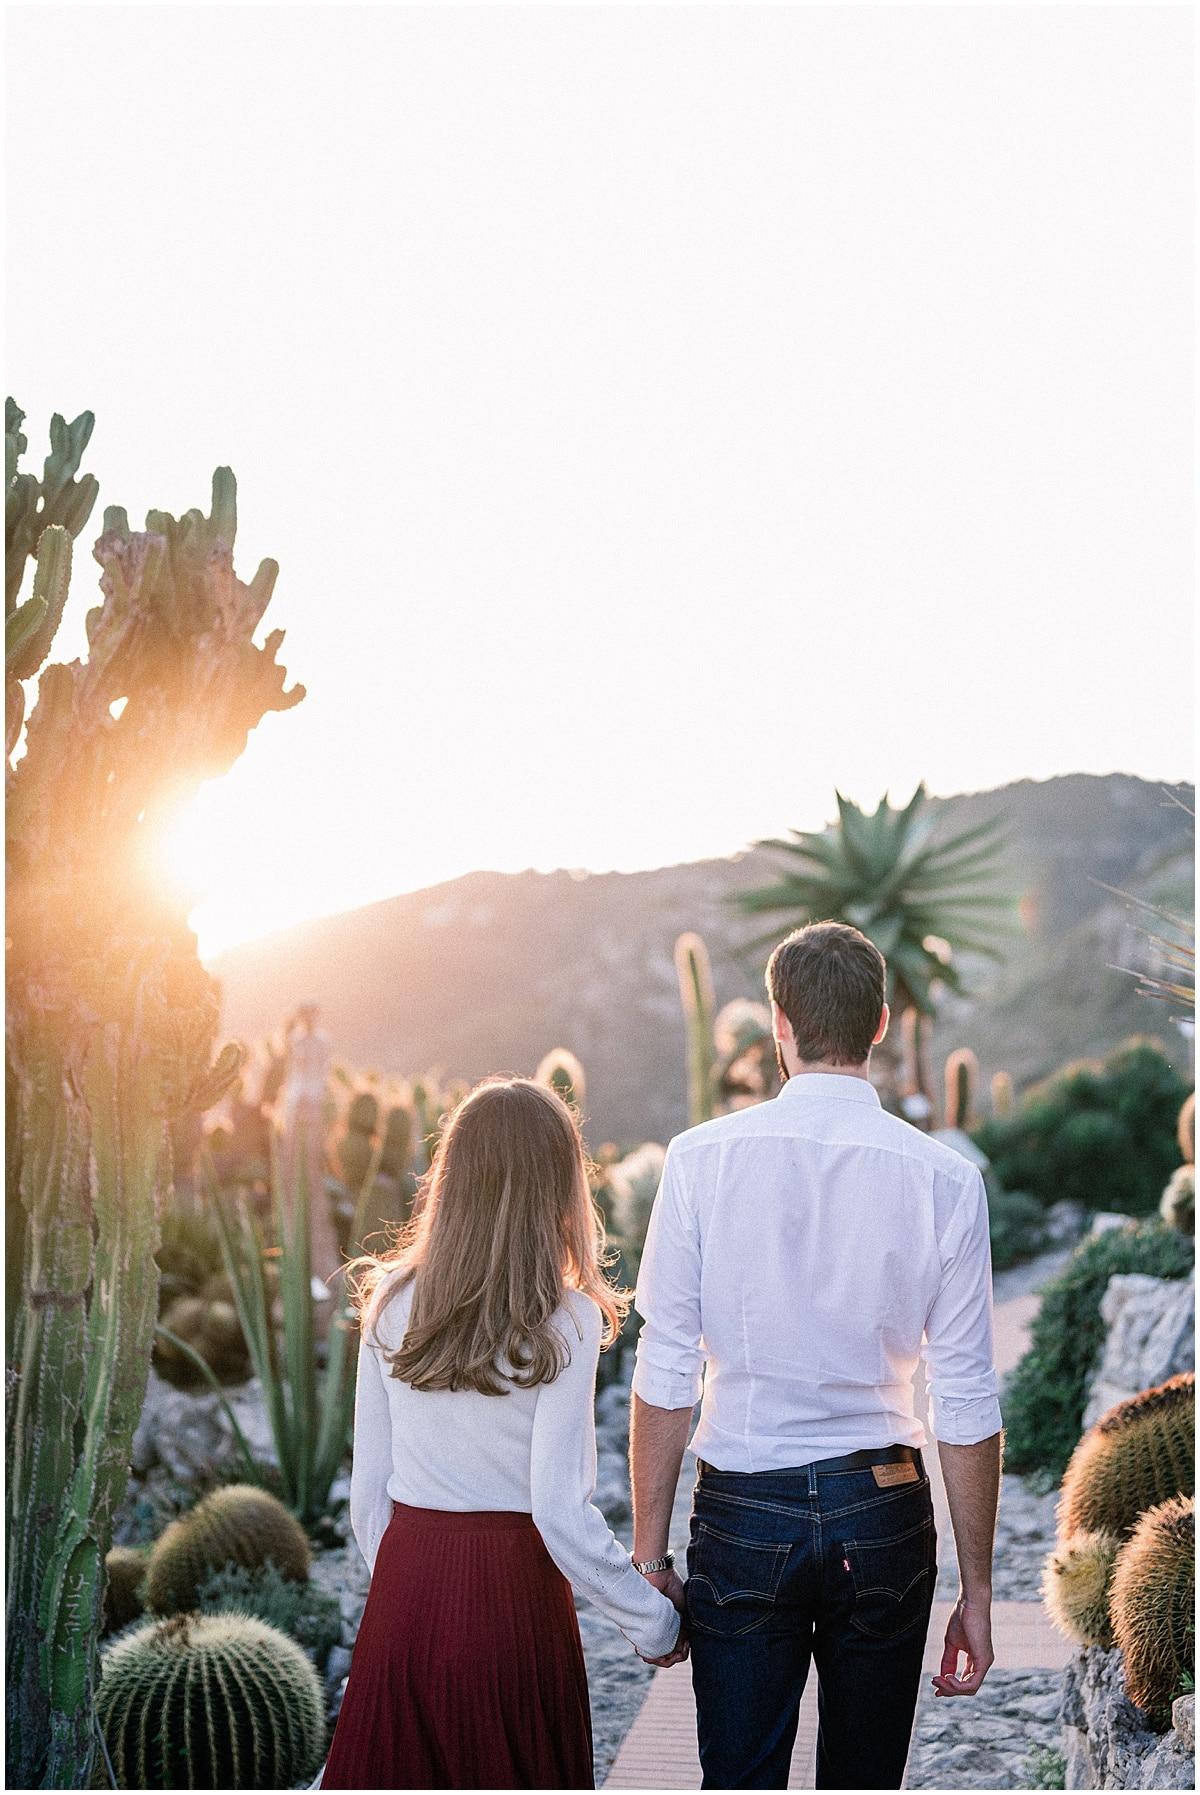 Engagement photo Eze village french Riviera Photography